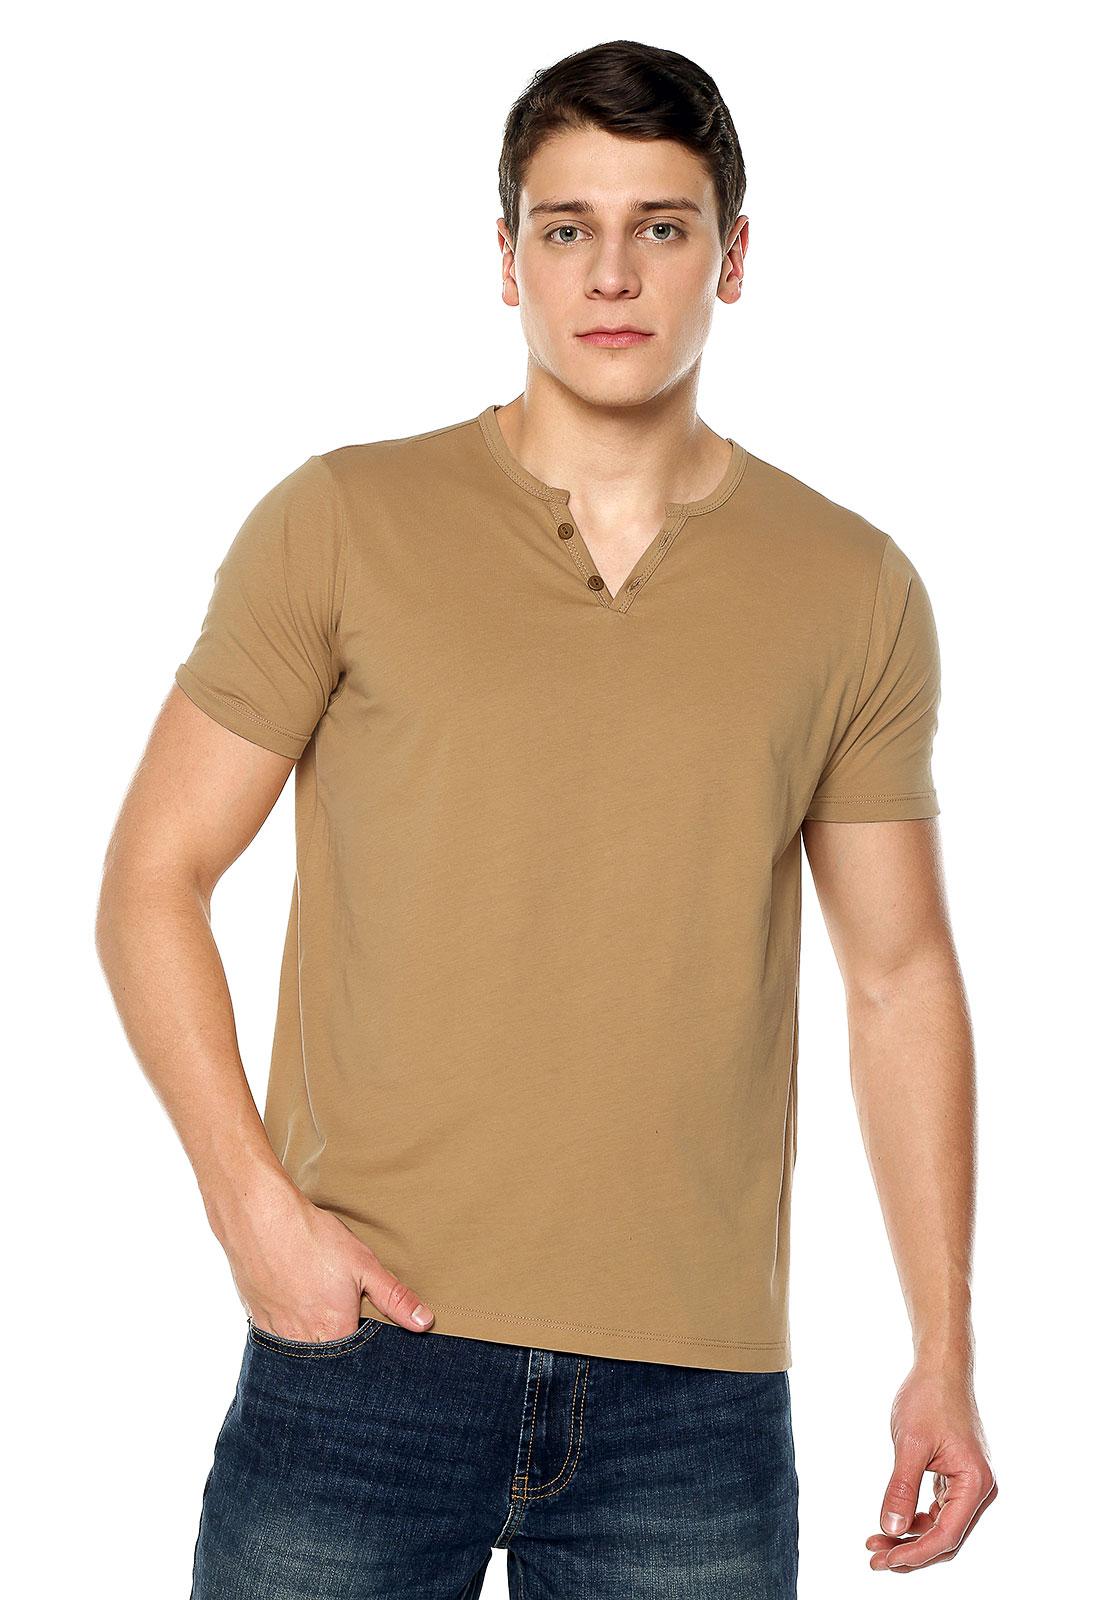 Camiseta Con Botones - Ocre | Polovers